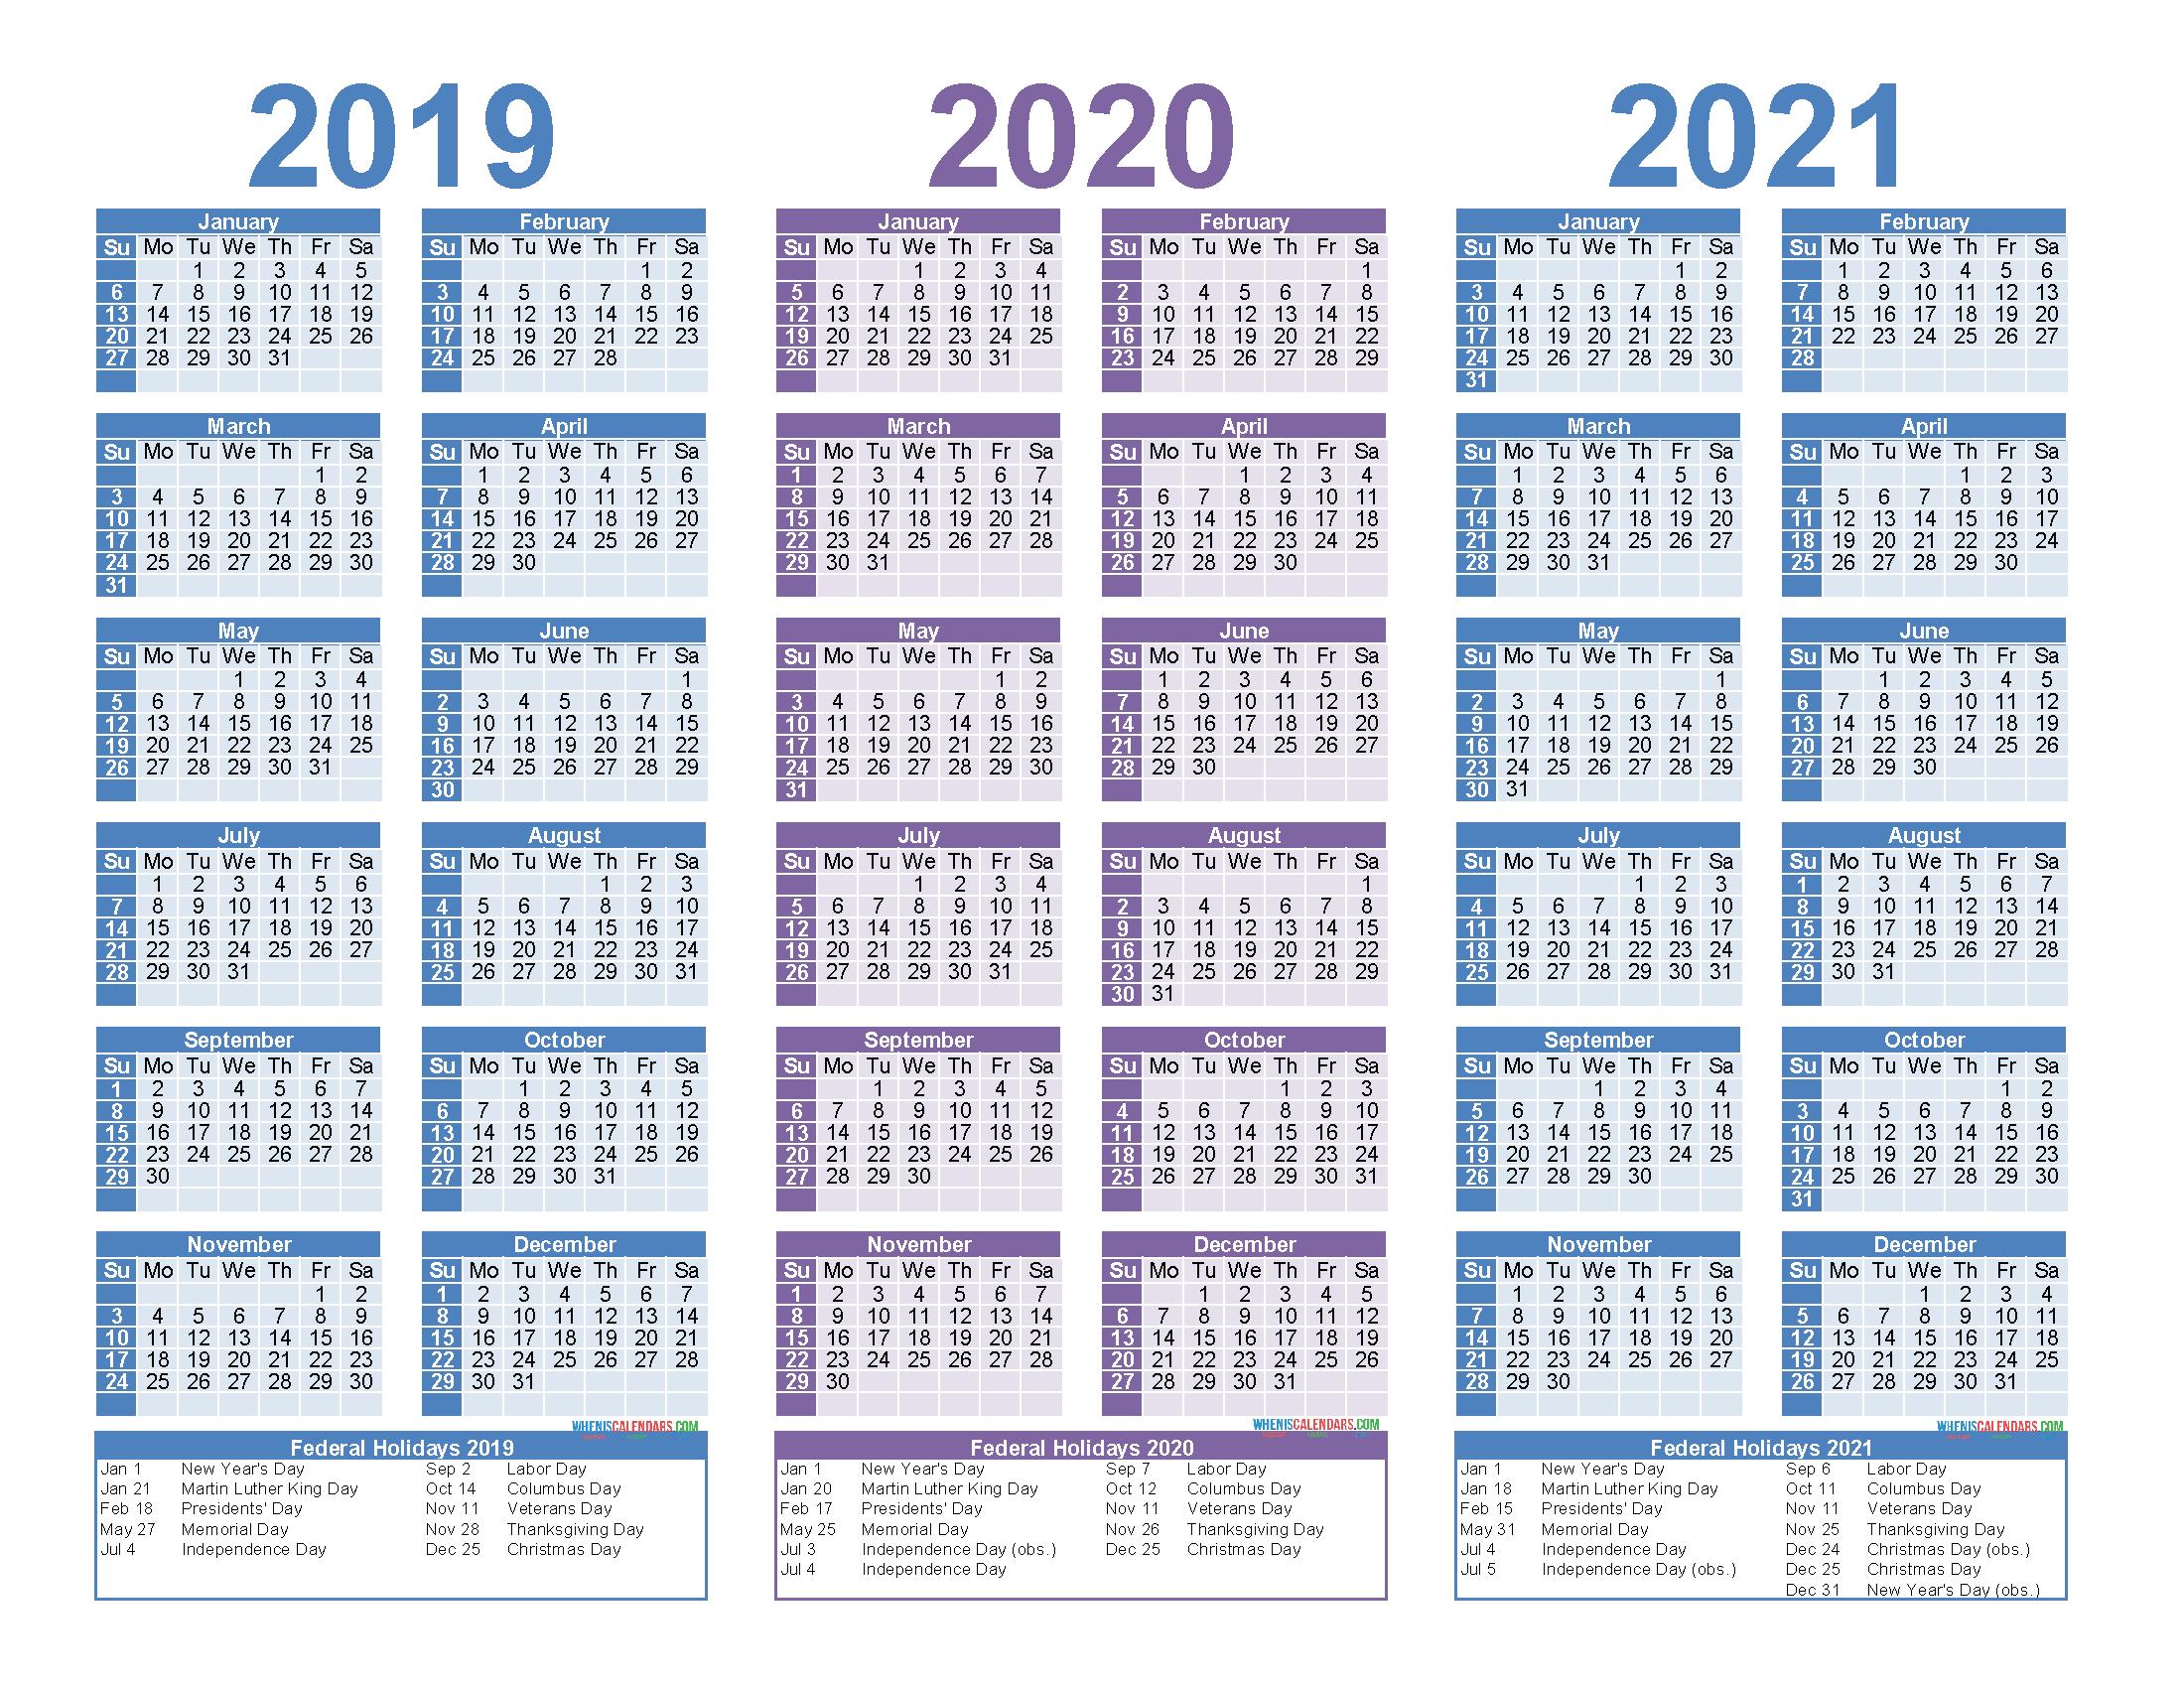 2019 2020 2021 Free Calendar Template 3 Year Calendar within 2 Year Calendar Template 2020 2021